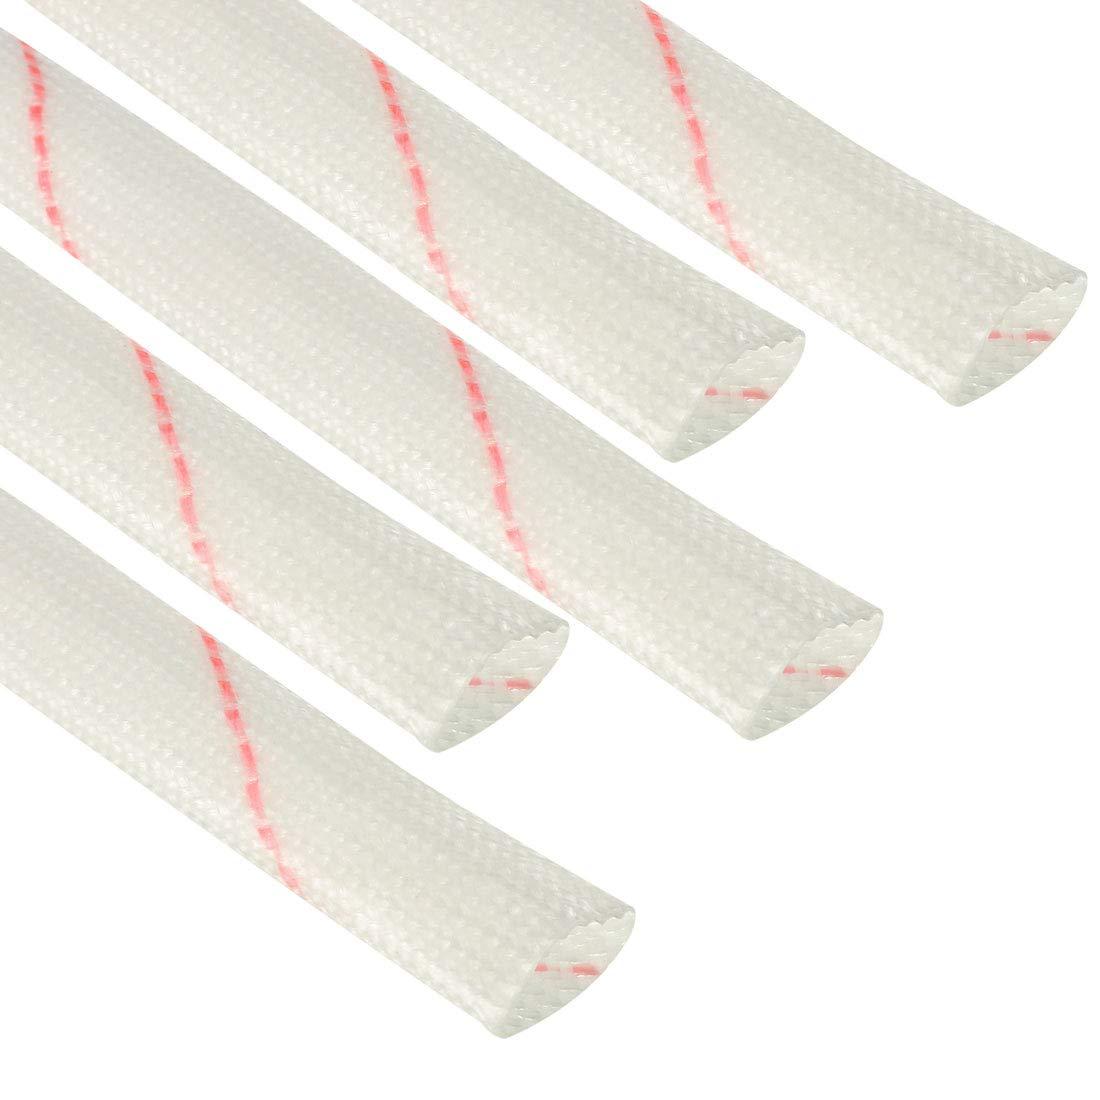 Sourcing Map Fiberglash/ülse PVC Isolierung Rohr 1500V Schlauch Verstellbare H/ülse Rohr 125 Grad Celsius Kabelumwicklung Dr/ähte